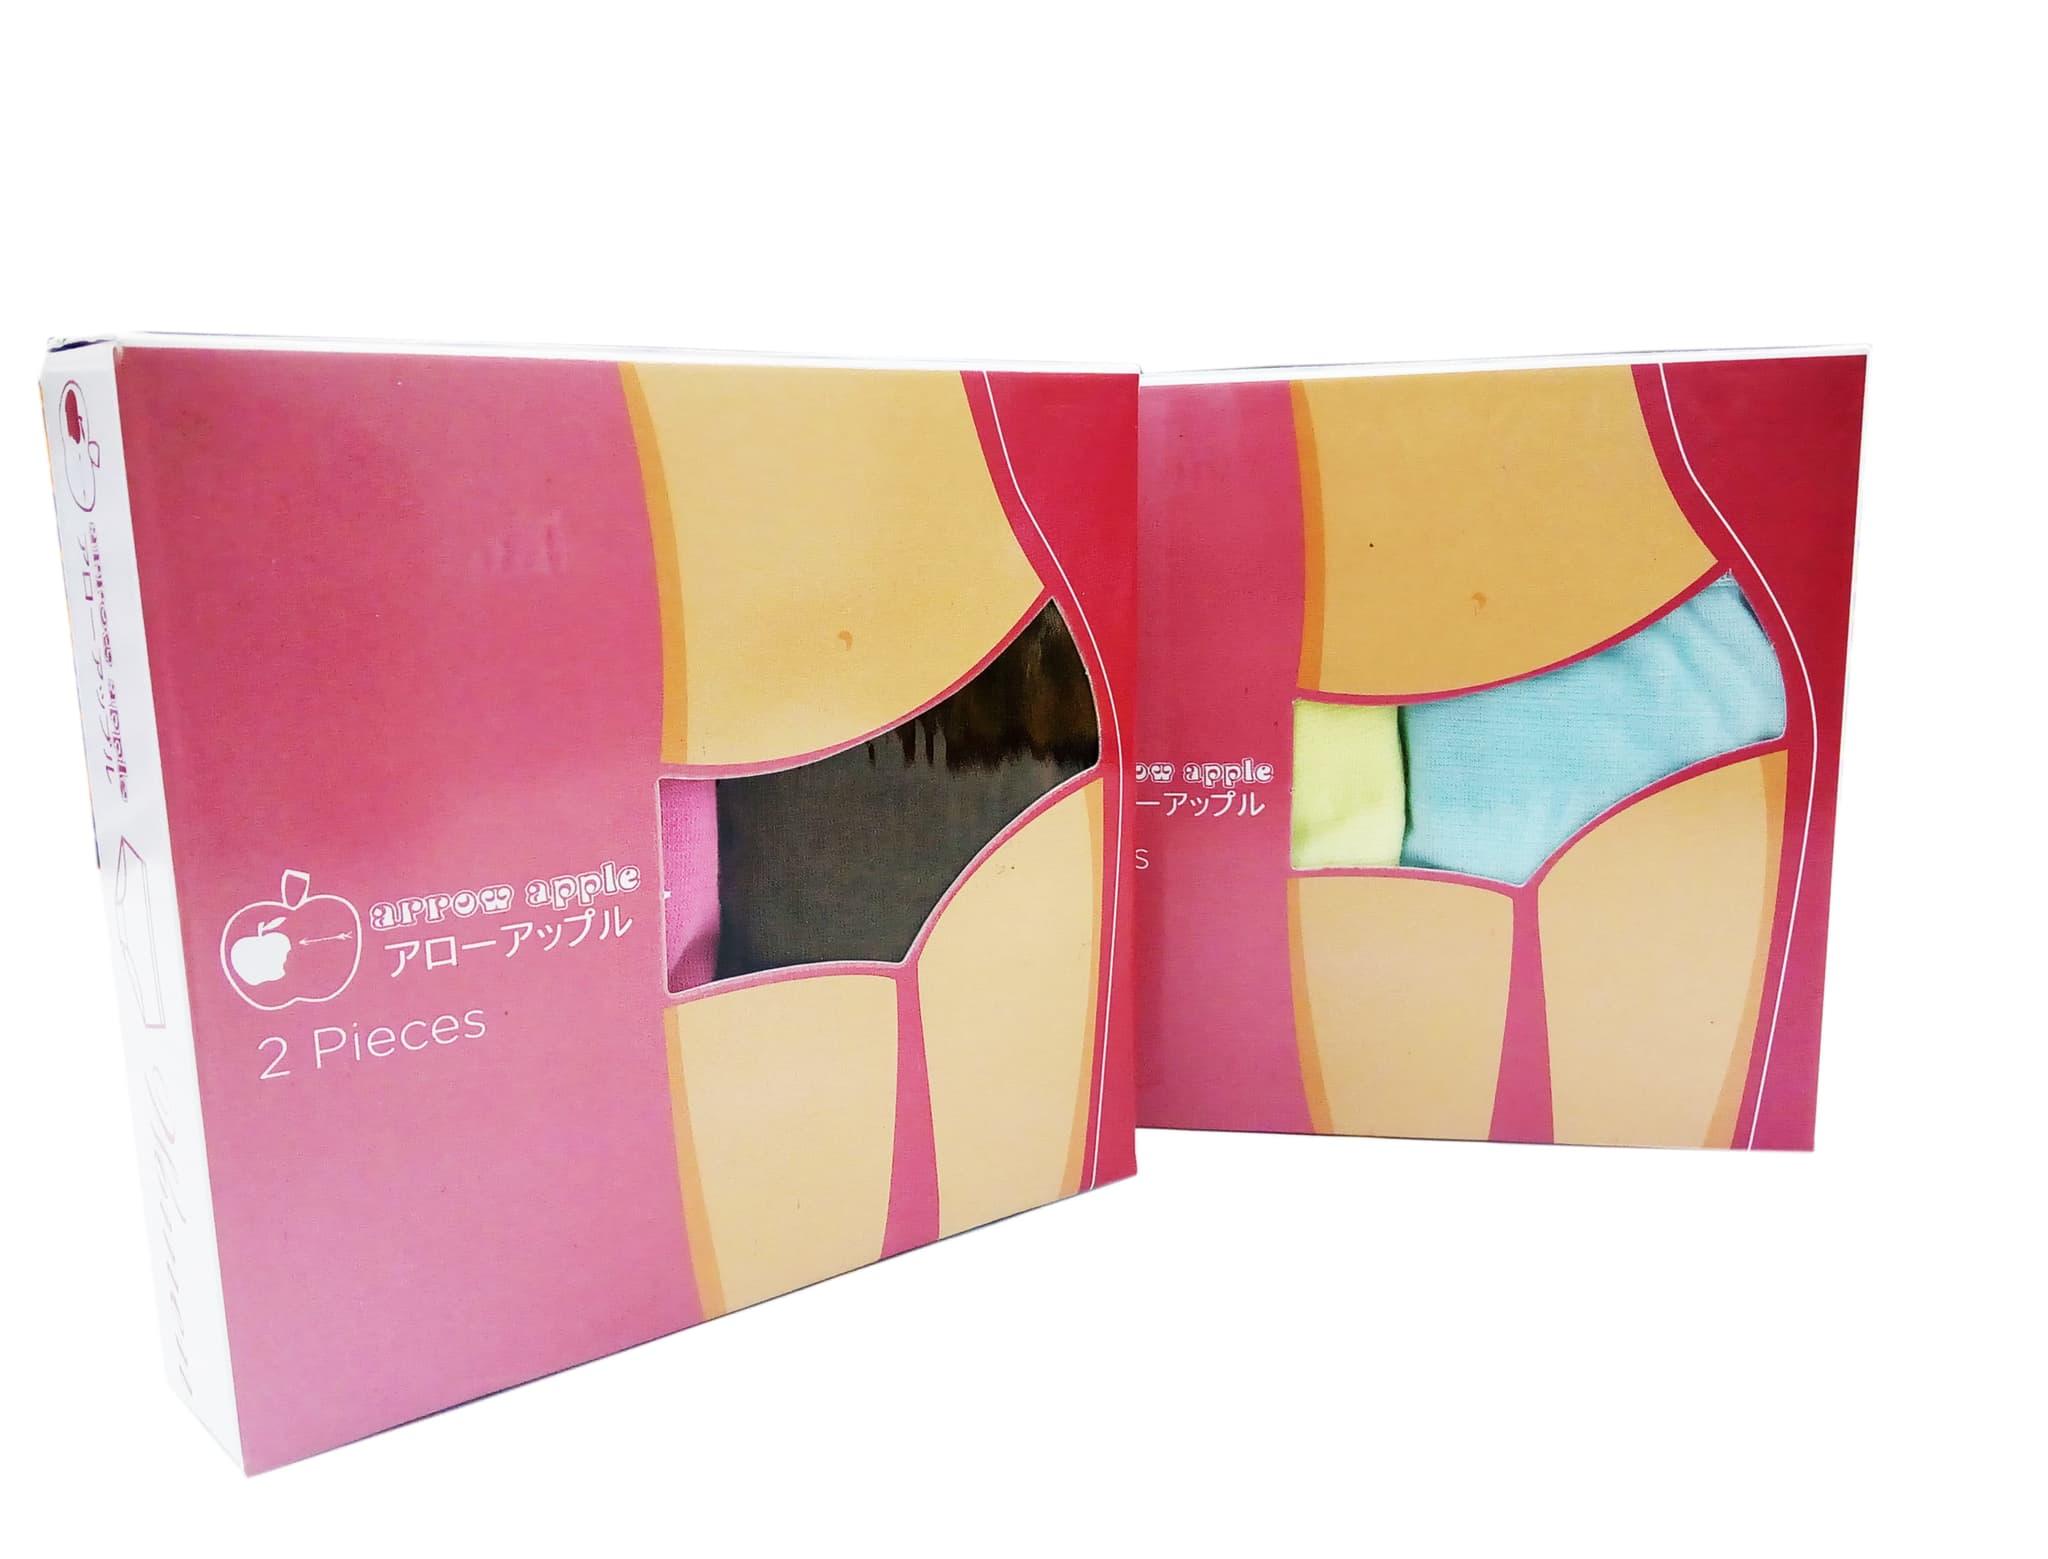 Jual Promo Termurah Celana Dalam Wanita 9926 2 Pcs - Merah Muda f6b7cba182